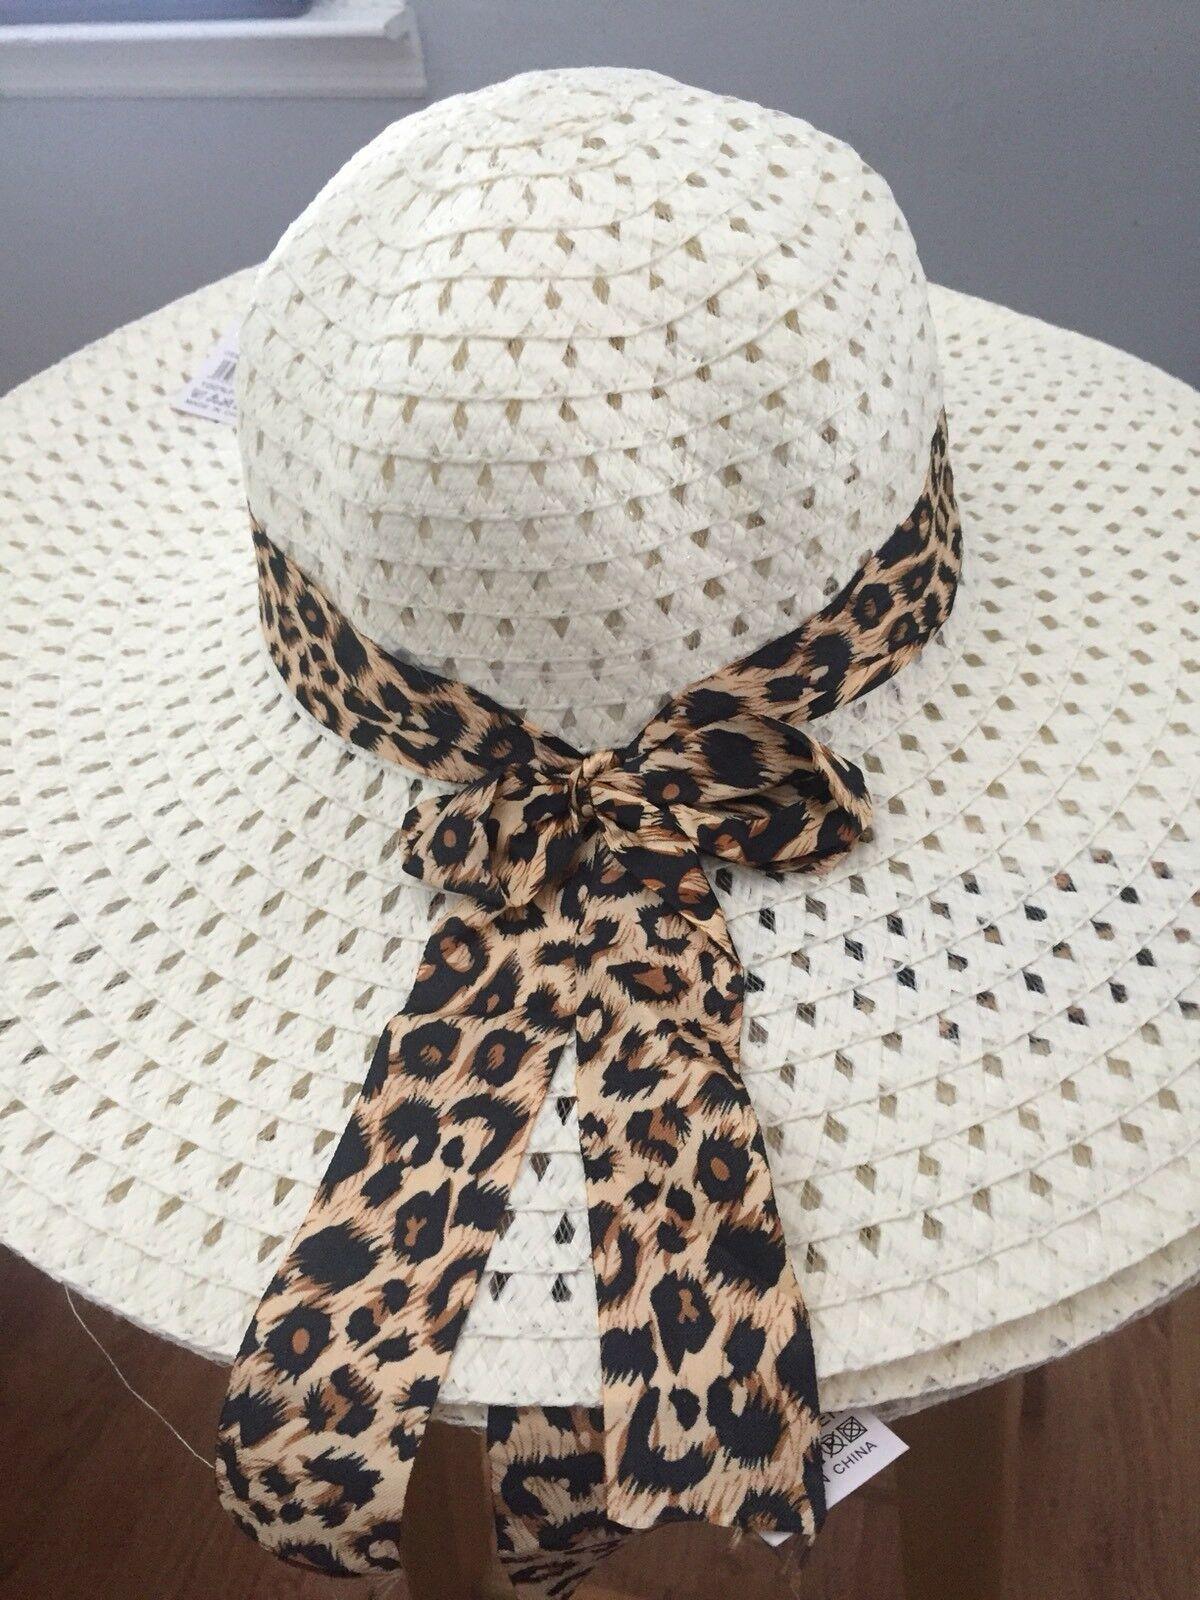 ( WHITE) Sun-Floppy-Hat--Beach-Summer-Wide-Brim-With-Animal-Print-Ribbon